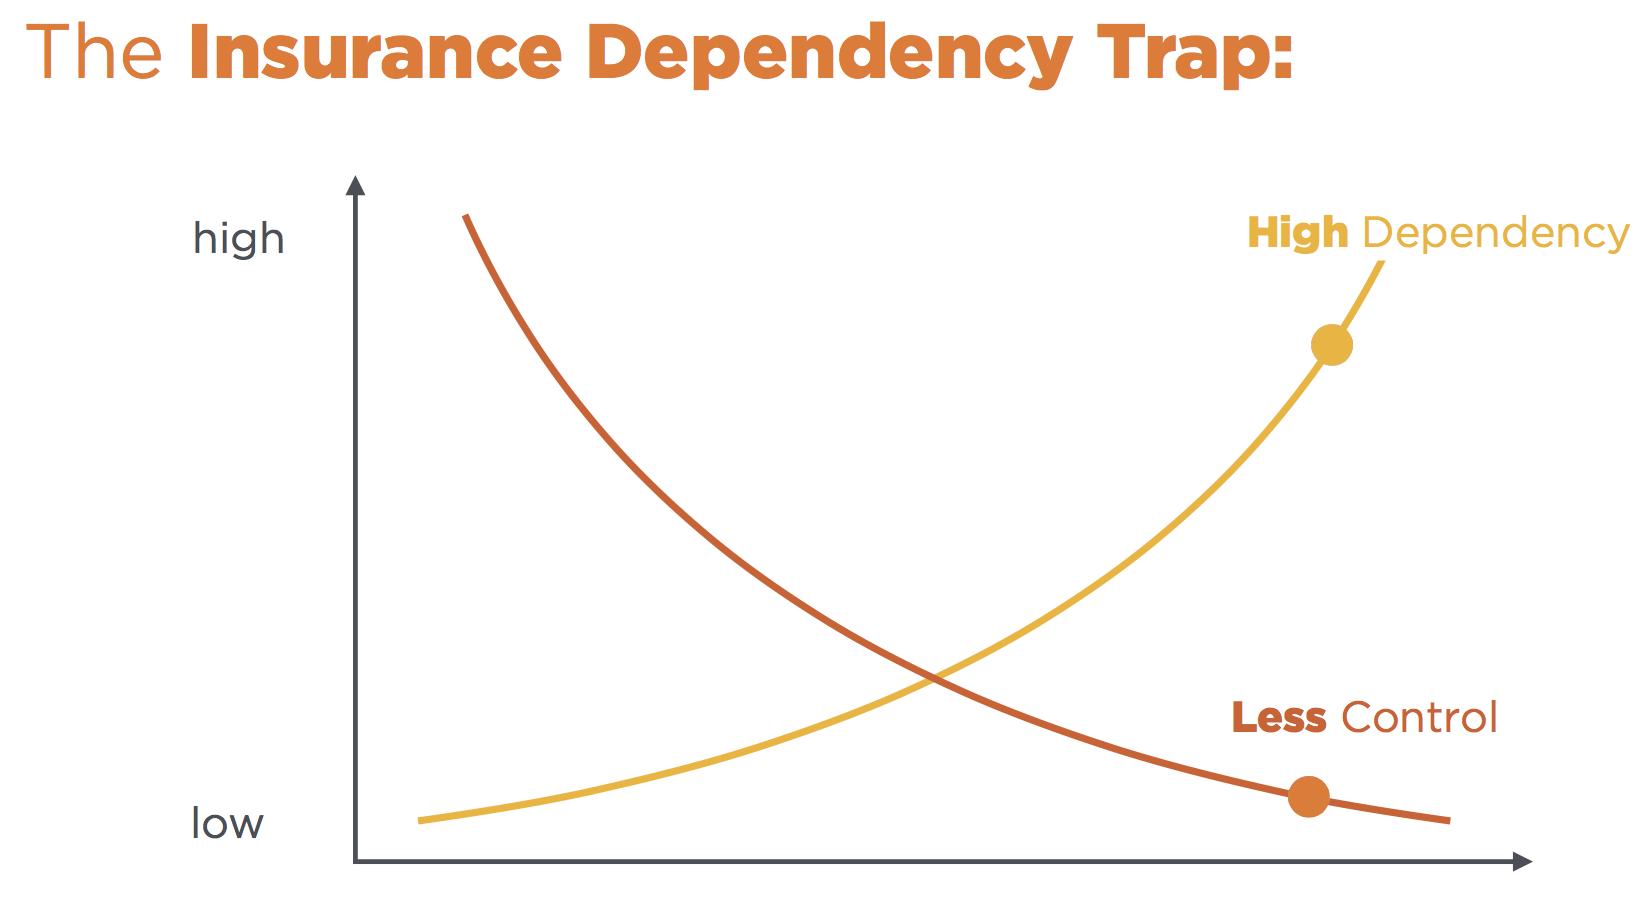 Insurance Dependency Trap